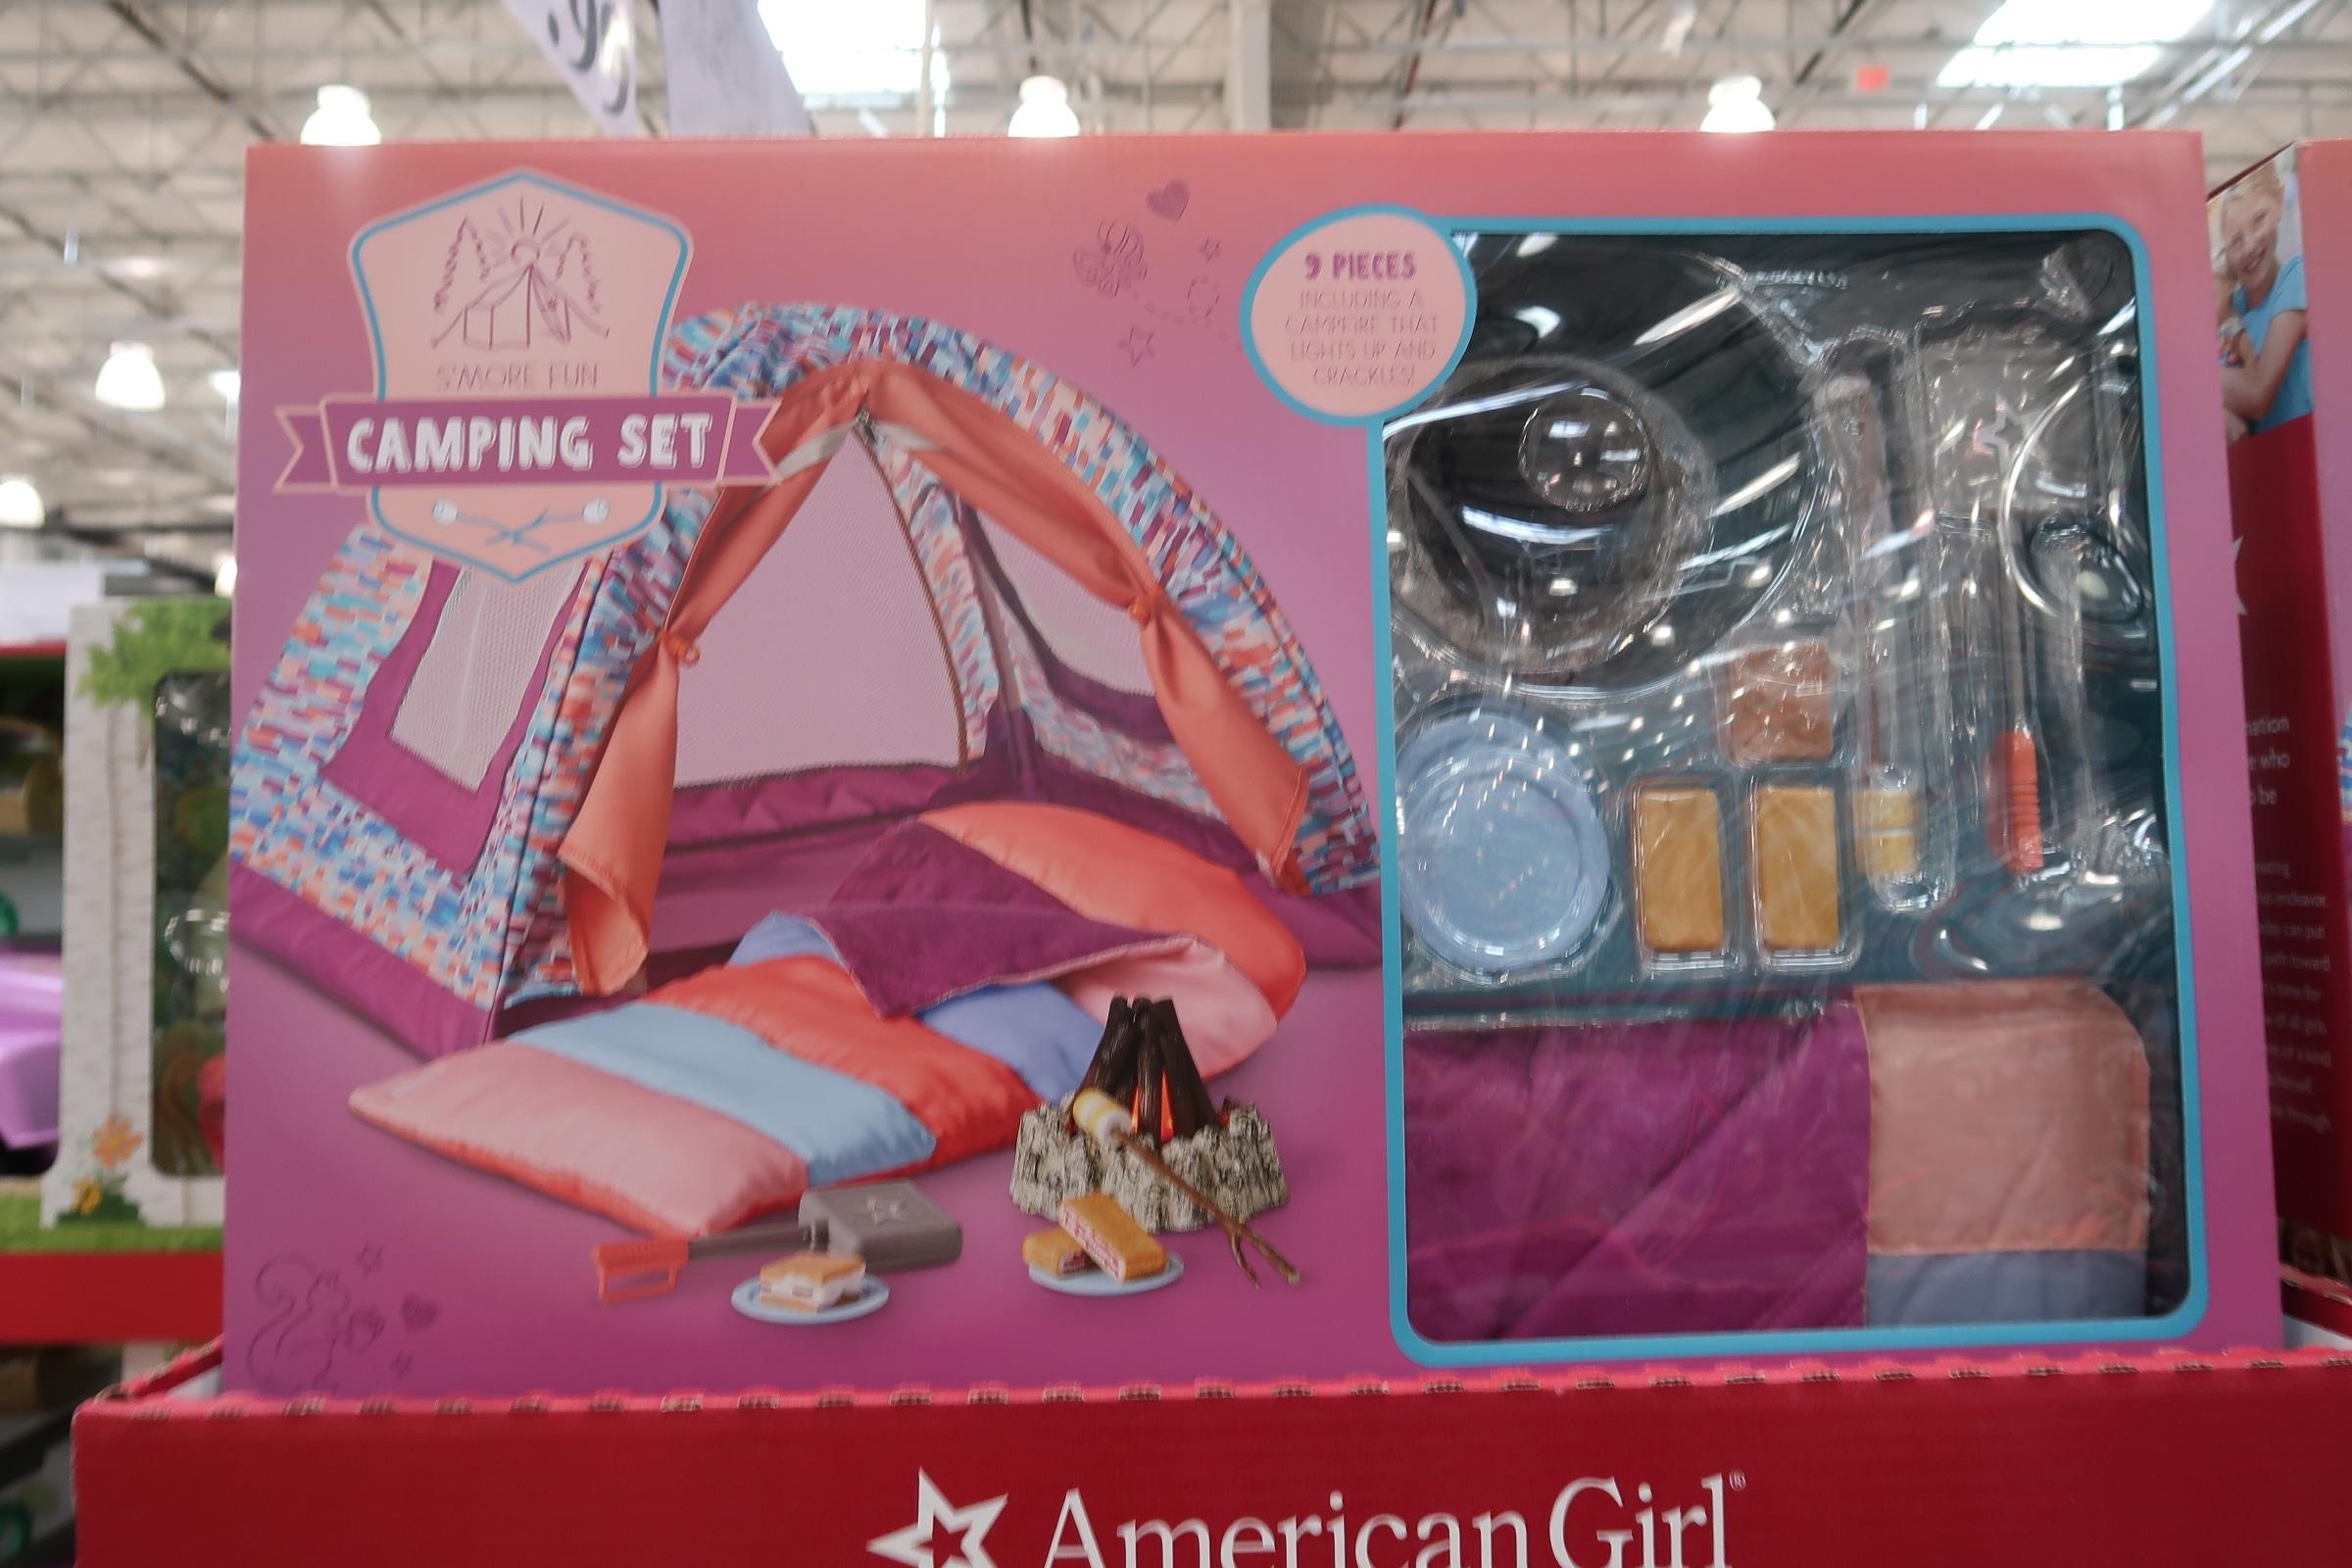 American Girl Camping Set $69.99